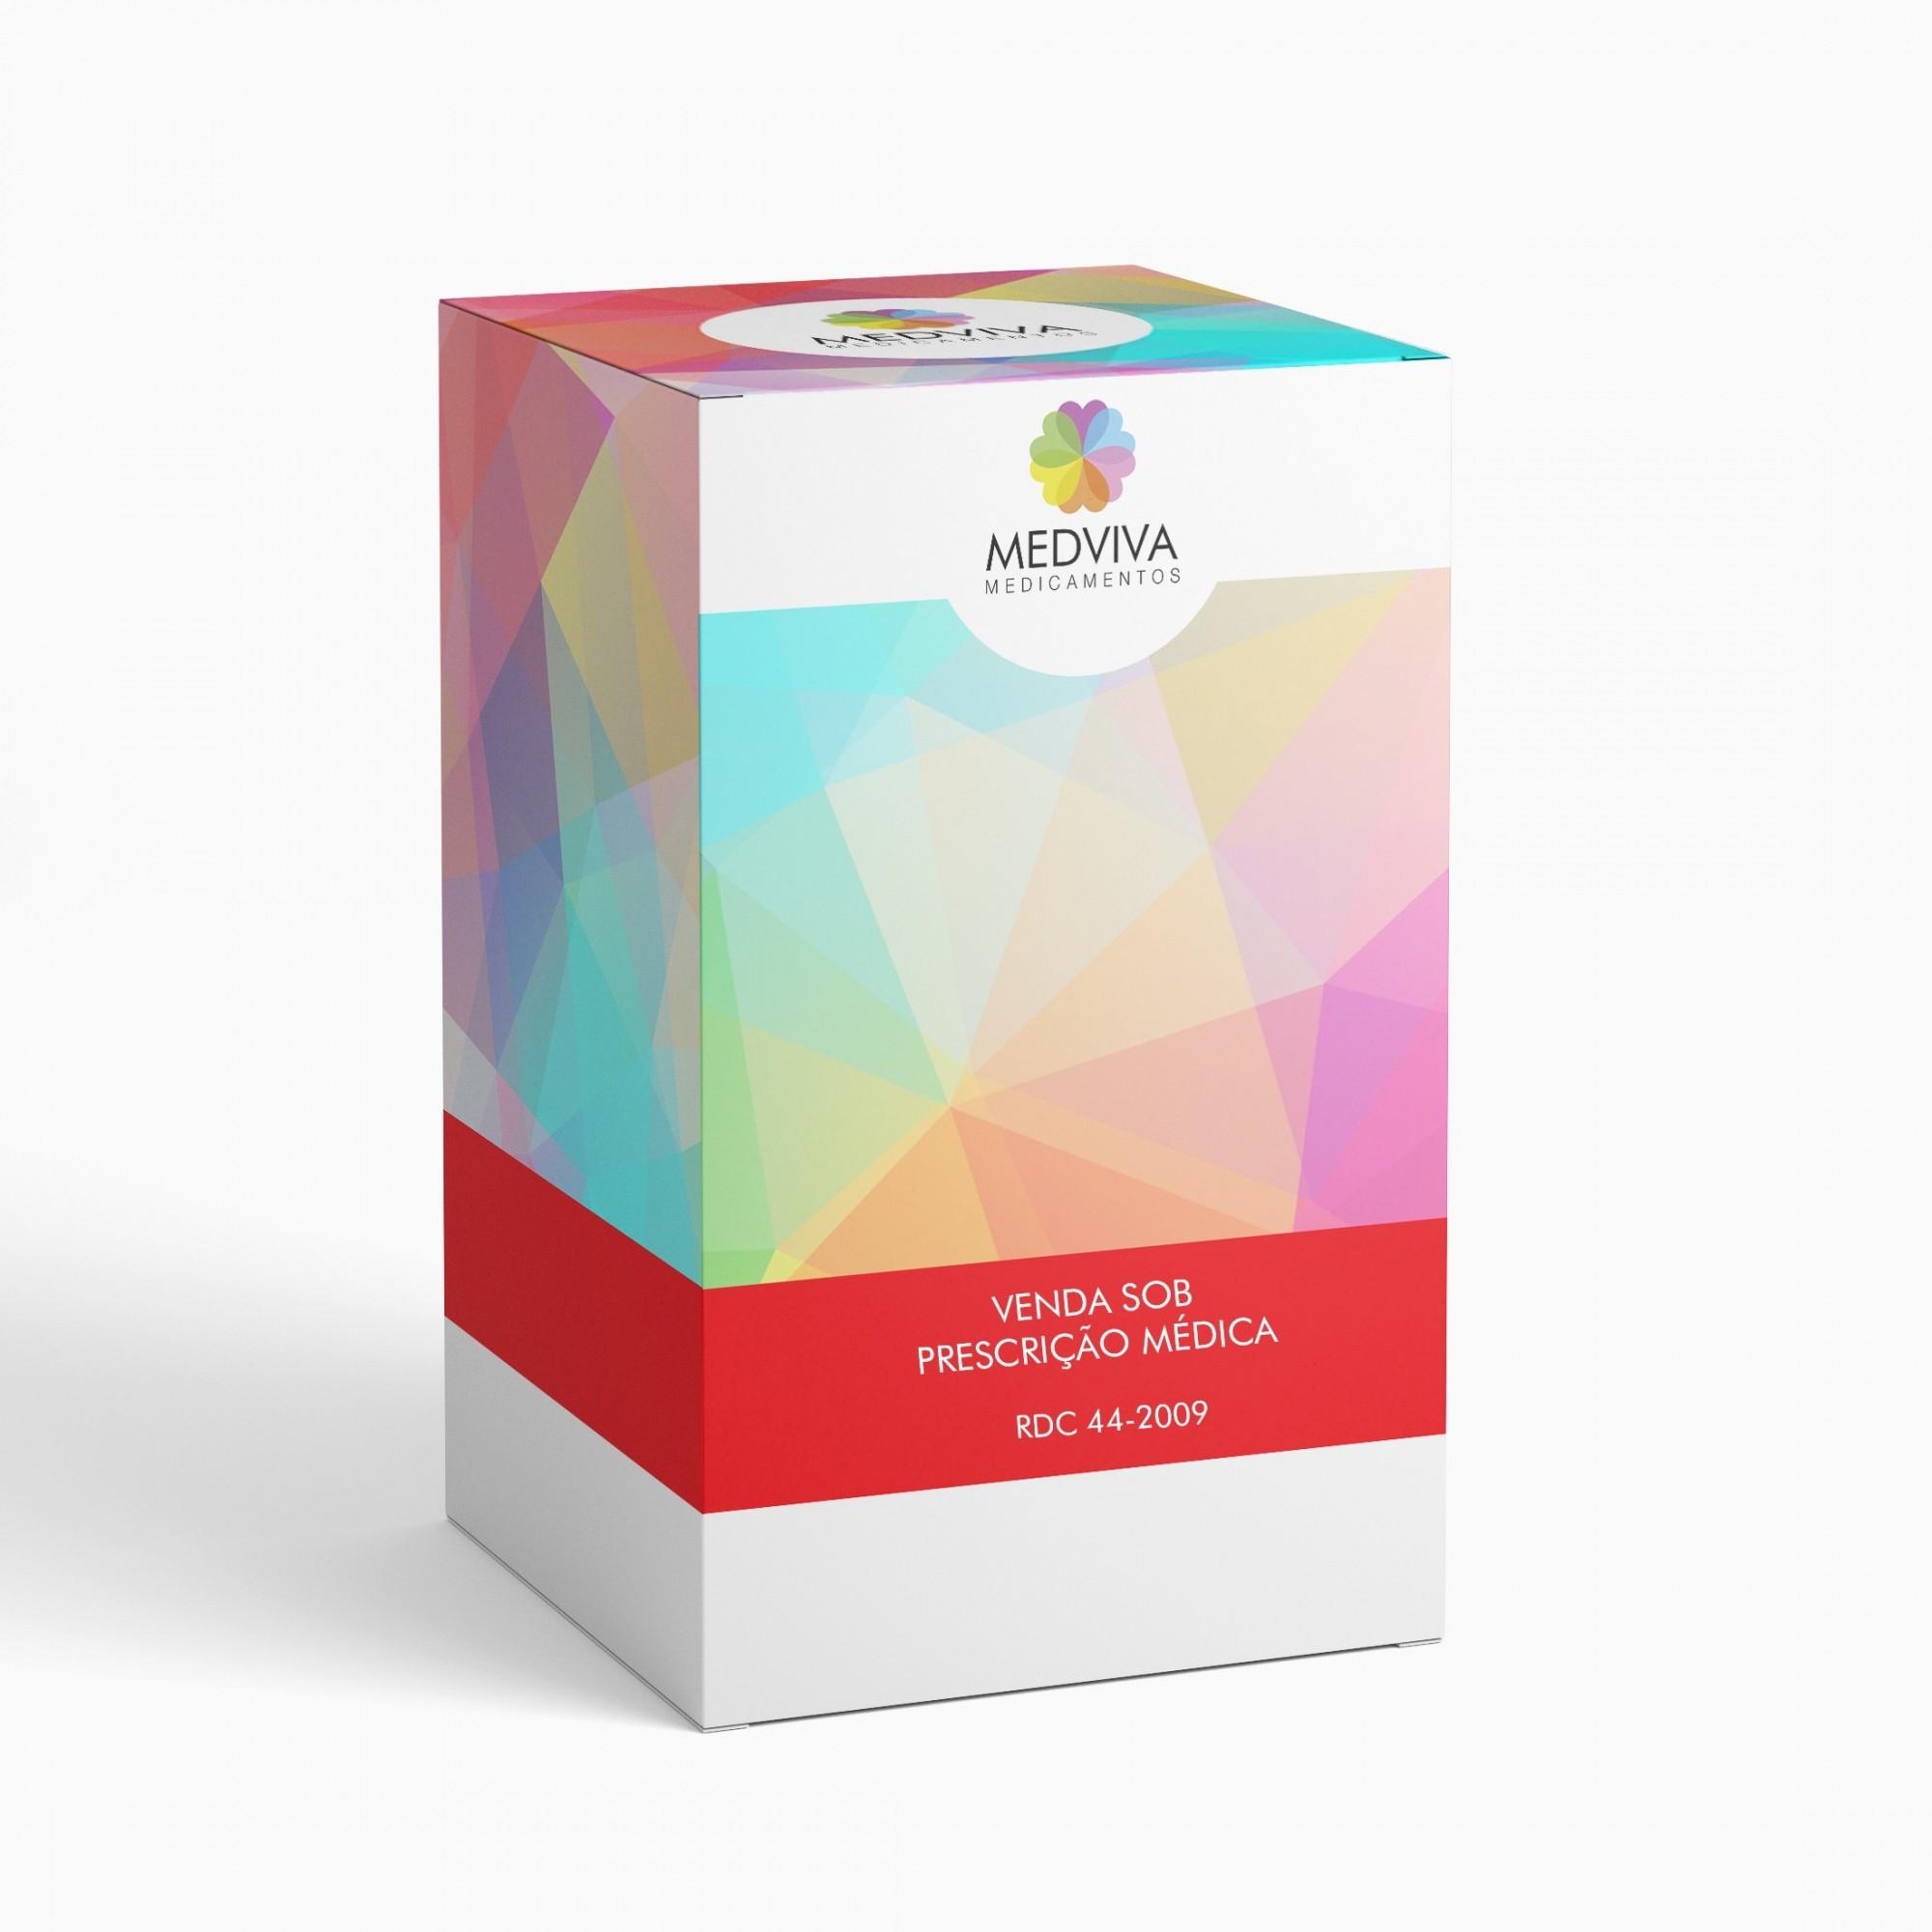 Cloridrato De Pioglitazona 30 mg 15 Comprimidos Germed